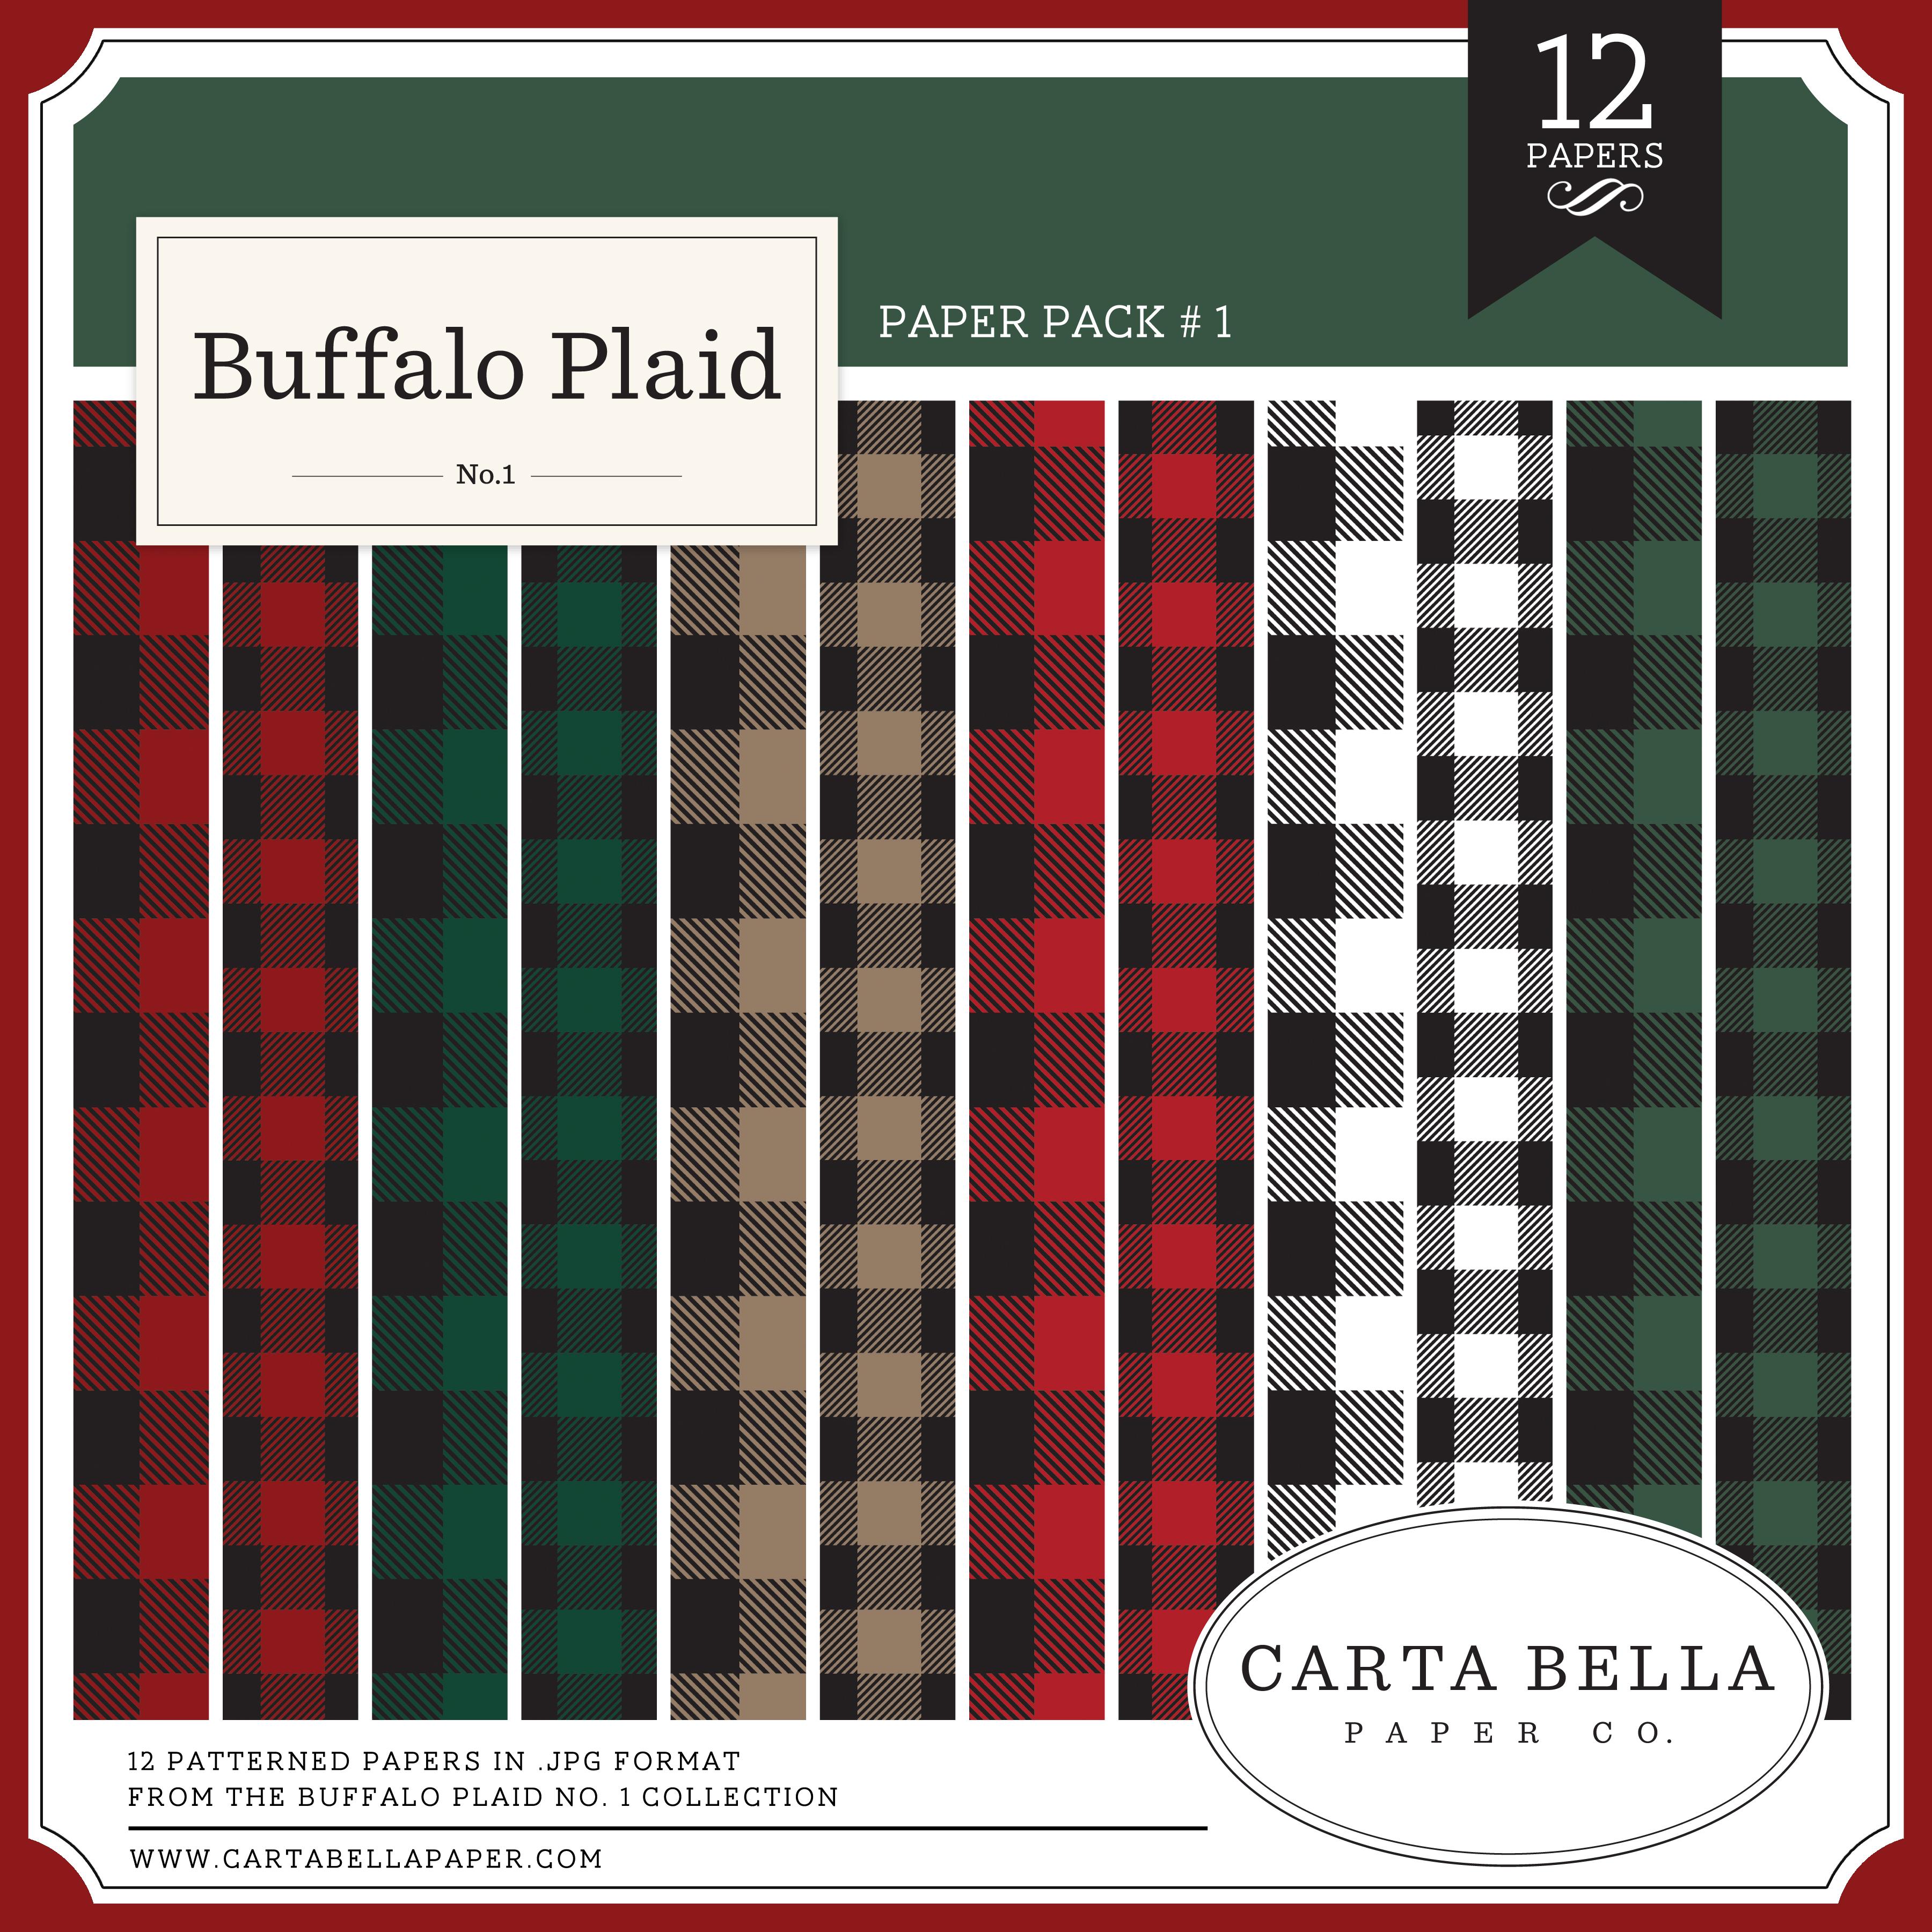 Buffalo Plaid No. 1 Paper Pack